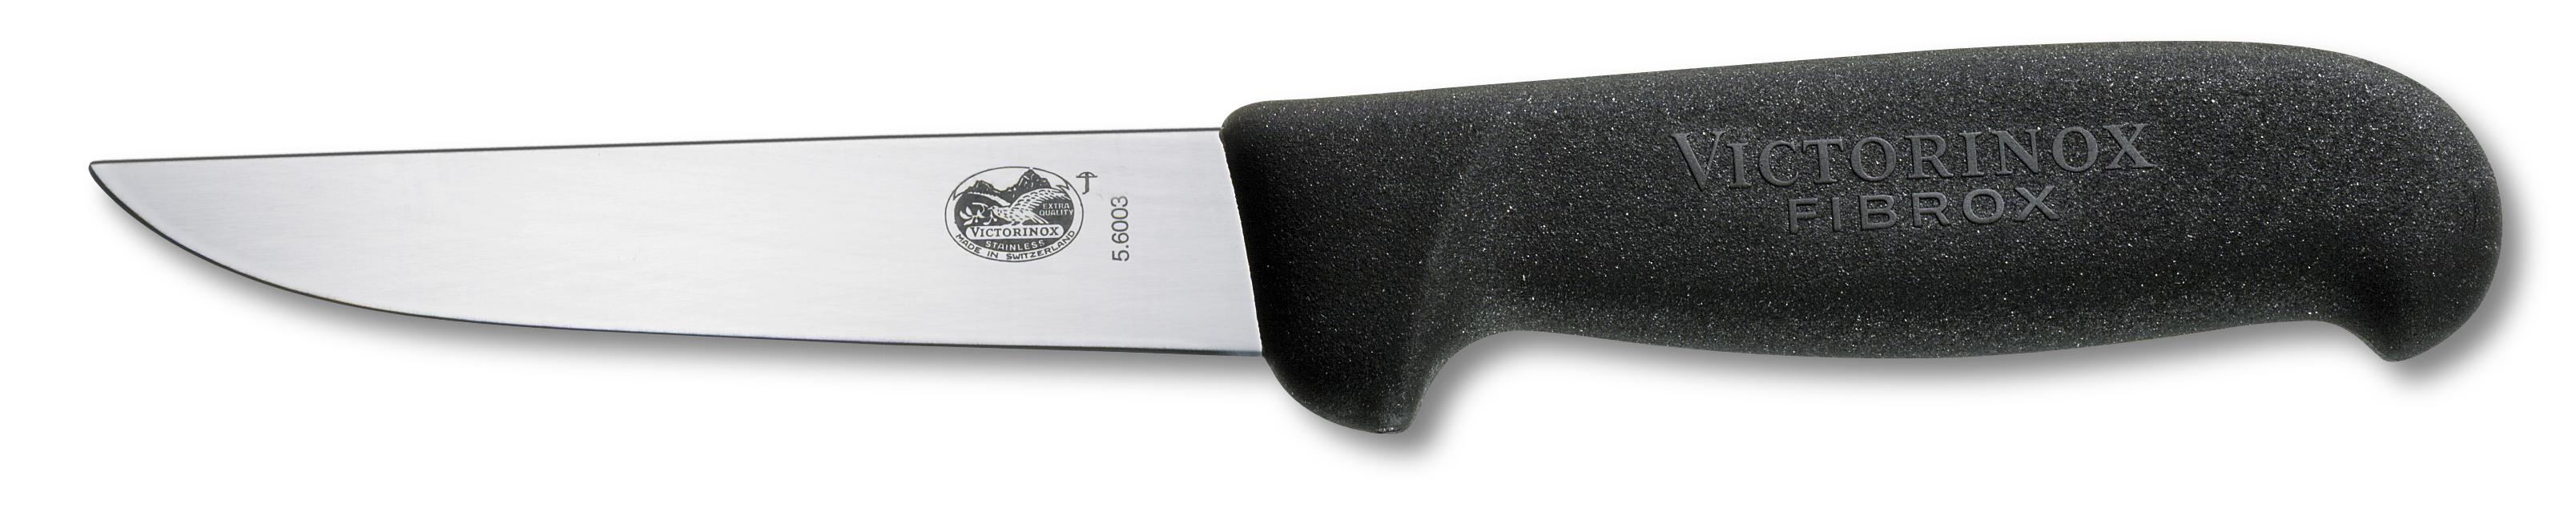 Victorinox Bouneri 12 cm     5.6003.12